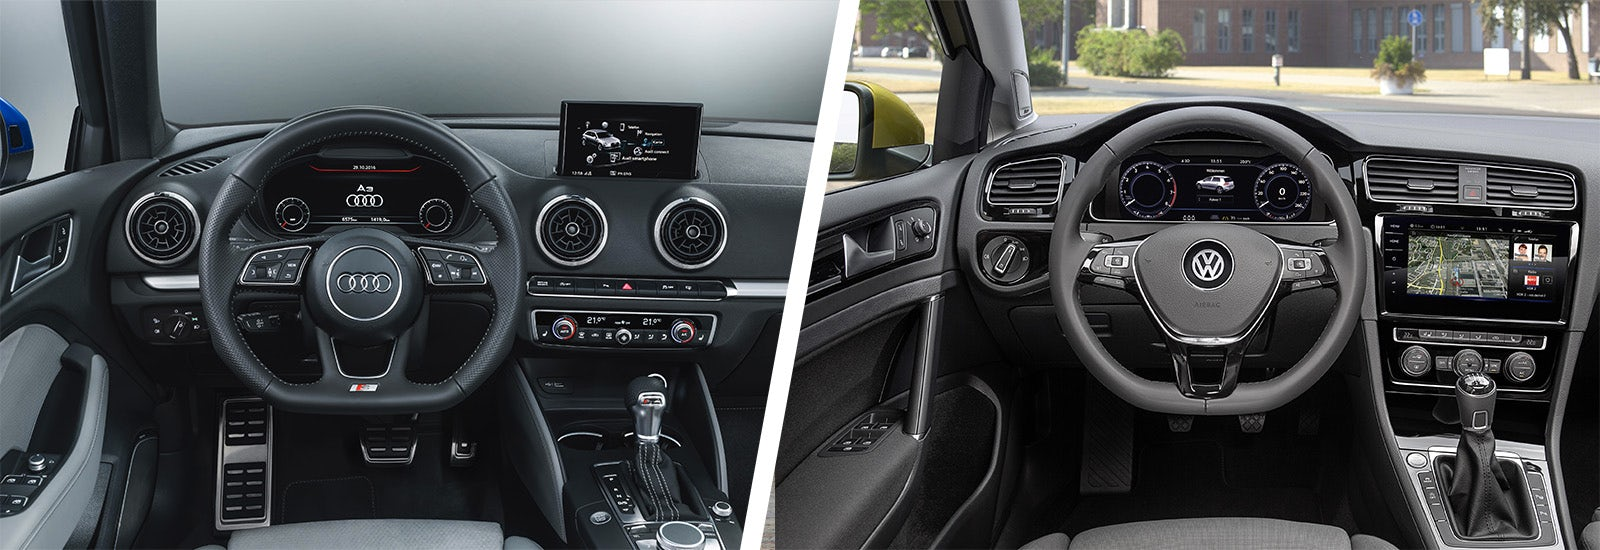 Audi A Vs VW Golf Sidebyside Comparison Carwow - Audi volkswagen